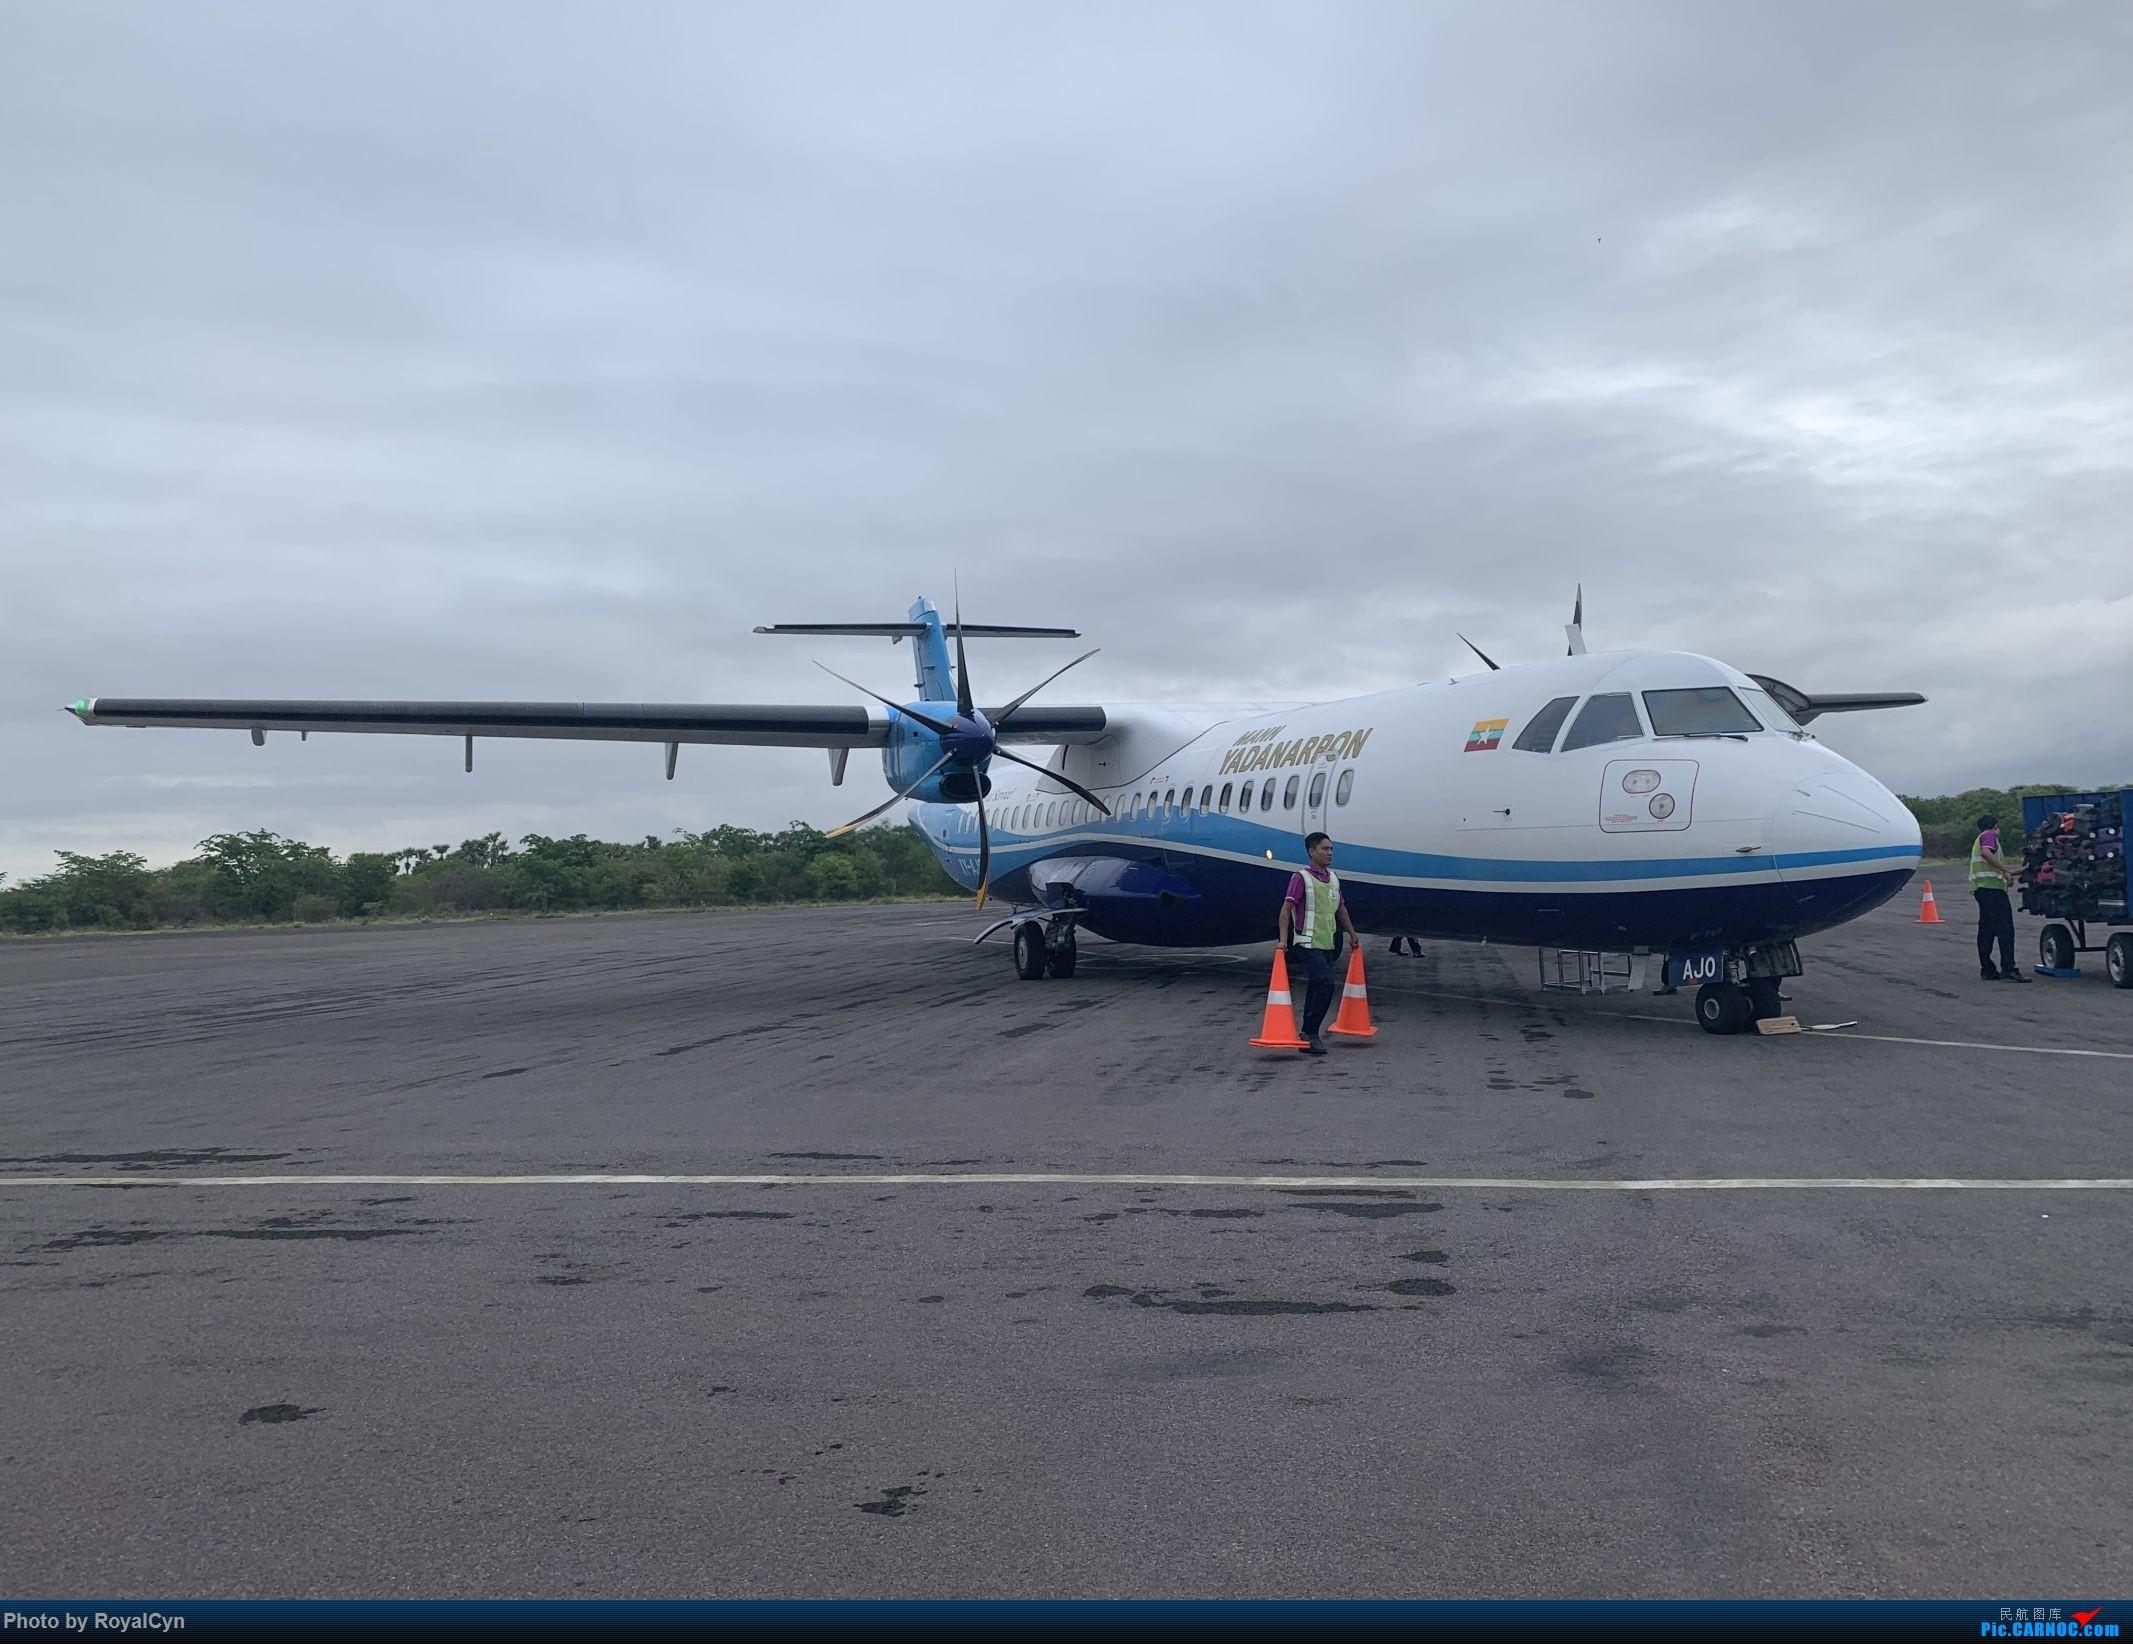 Re:[原创]Royal游记No.3【佛塔国度狂想曲——棉麻国缅甸】三城6日游 ATR-72 XY-AJO 缅甸良乌机场